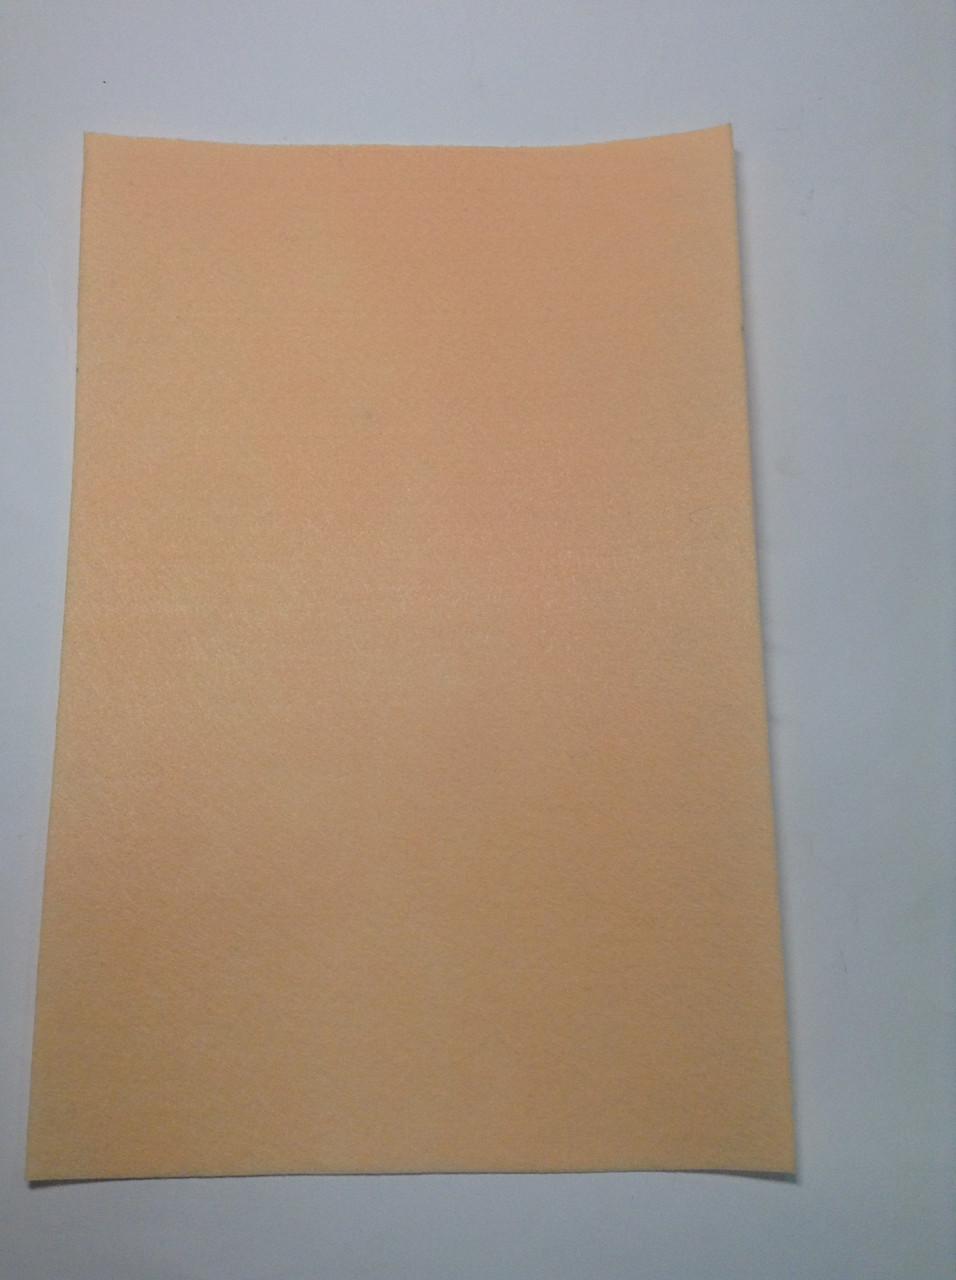 Фетр 1 мм (20х30 см) полиэстер